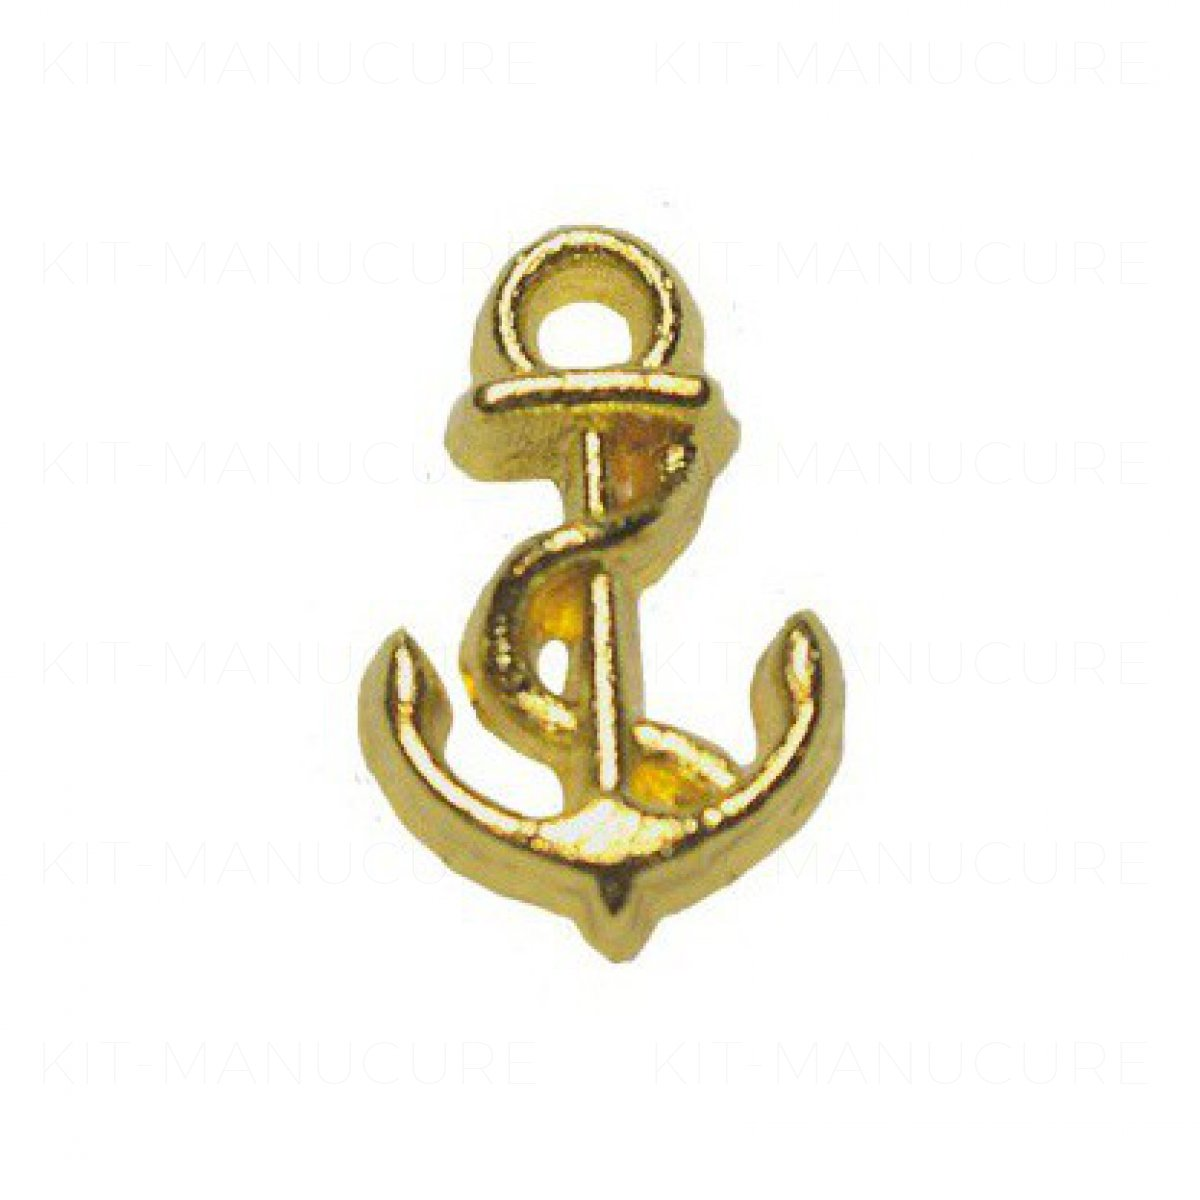 https://www.kit-manucure.com/857-thickbox_default/bijoux-pour-ongles-ancre-marine.jpg